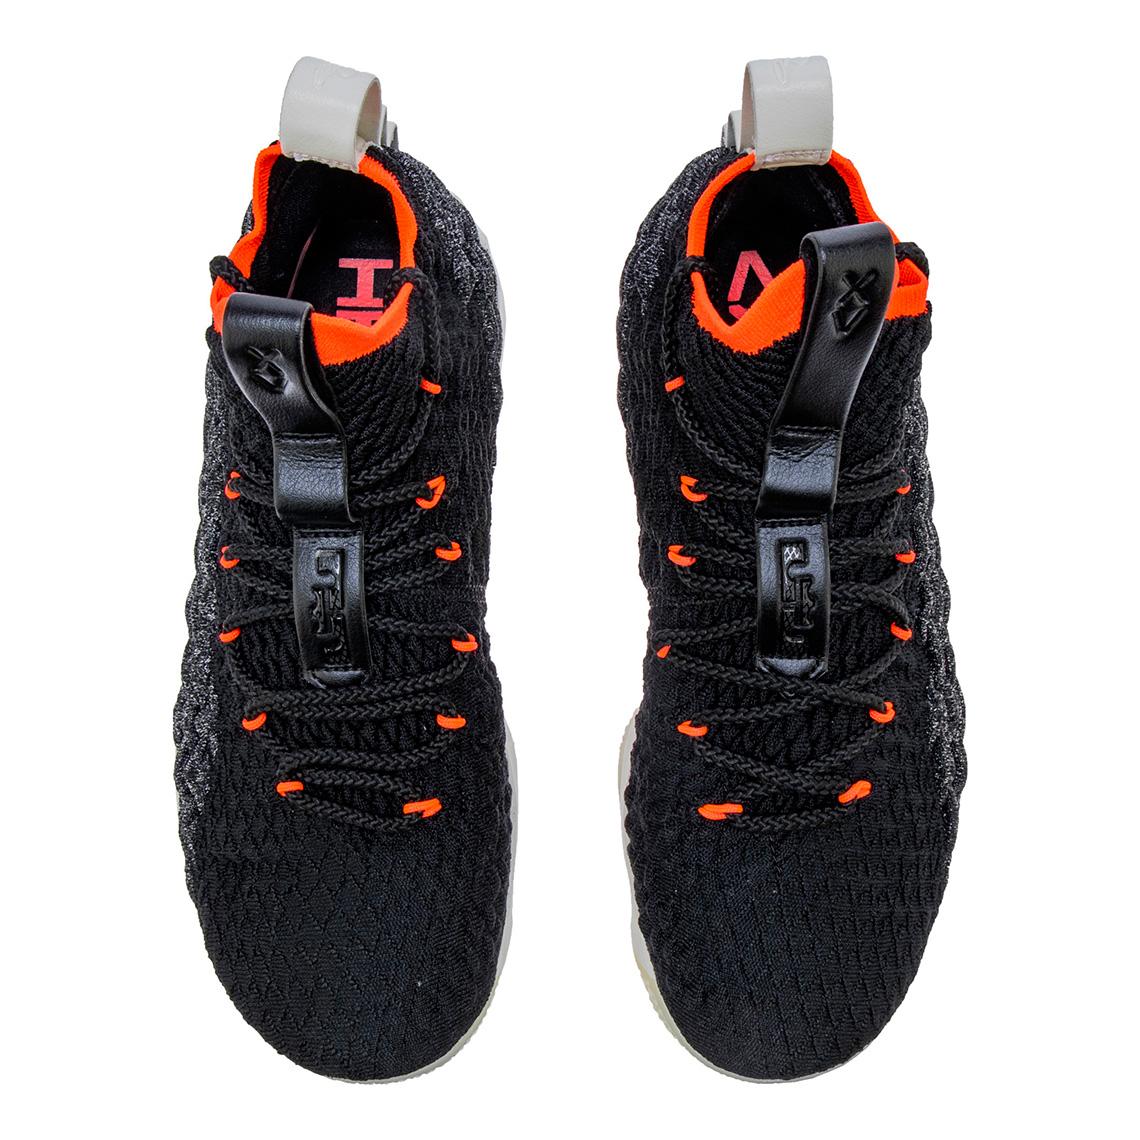 huge discount 03996 d51f1 Nike LeBron 15 Bright Crimson AQ2363-002 Release Info   SneakerNews.com